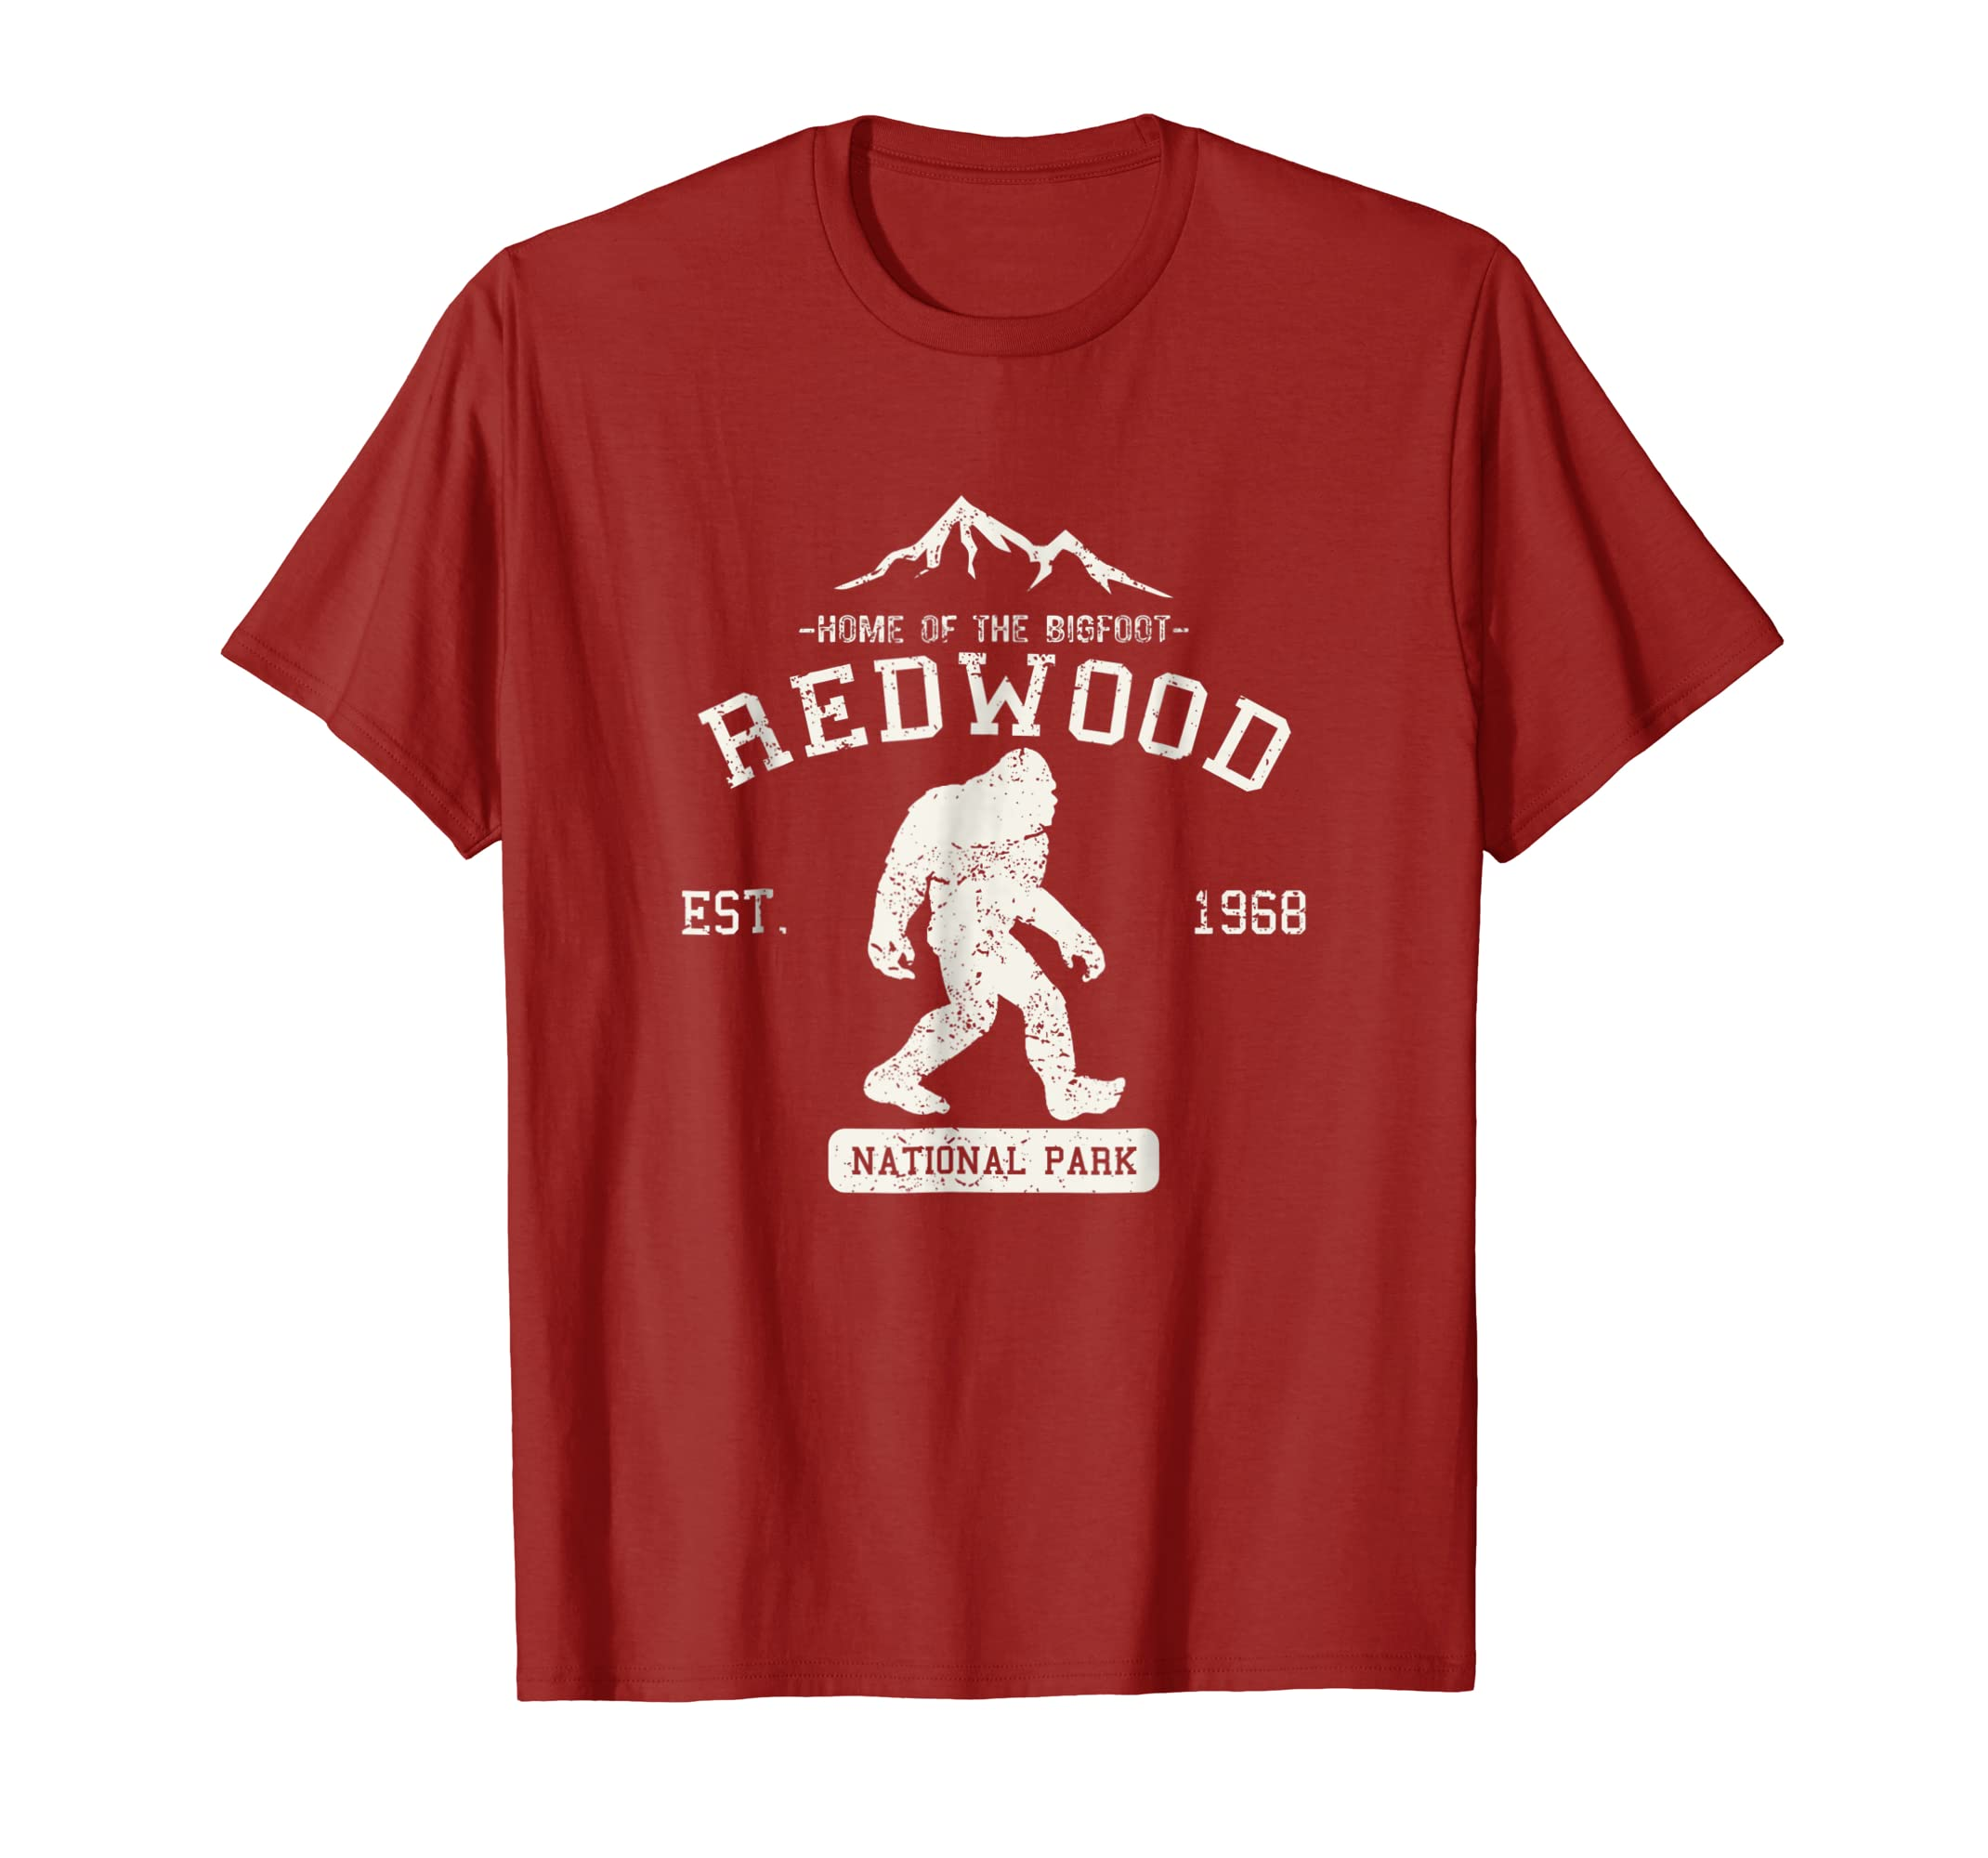 c41a03ffd Amazon.com: Redwood National Park Shirt Bigfoot T-shirt: Clothing